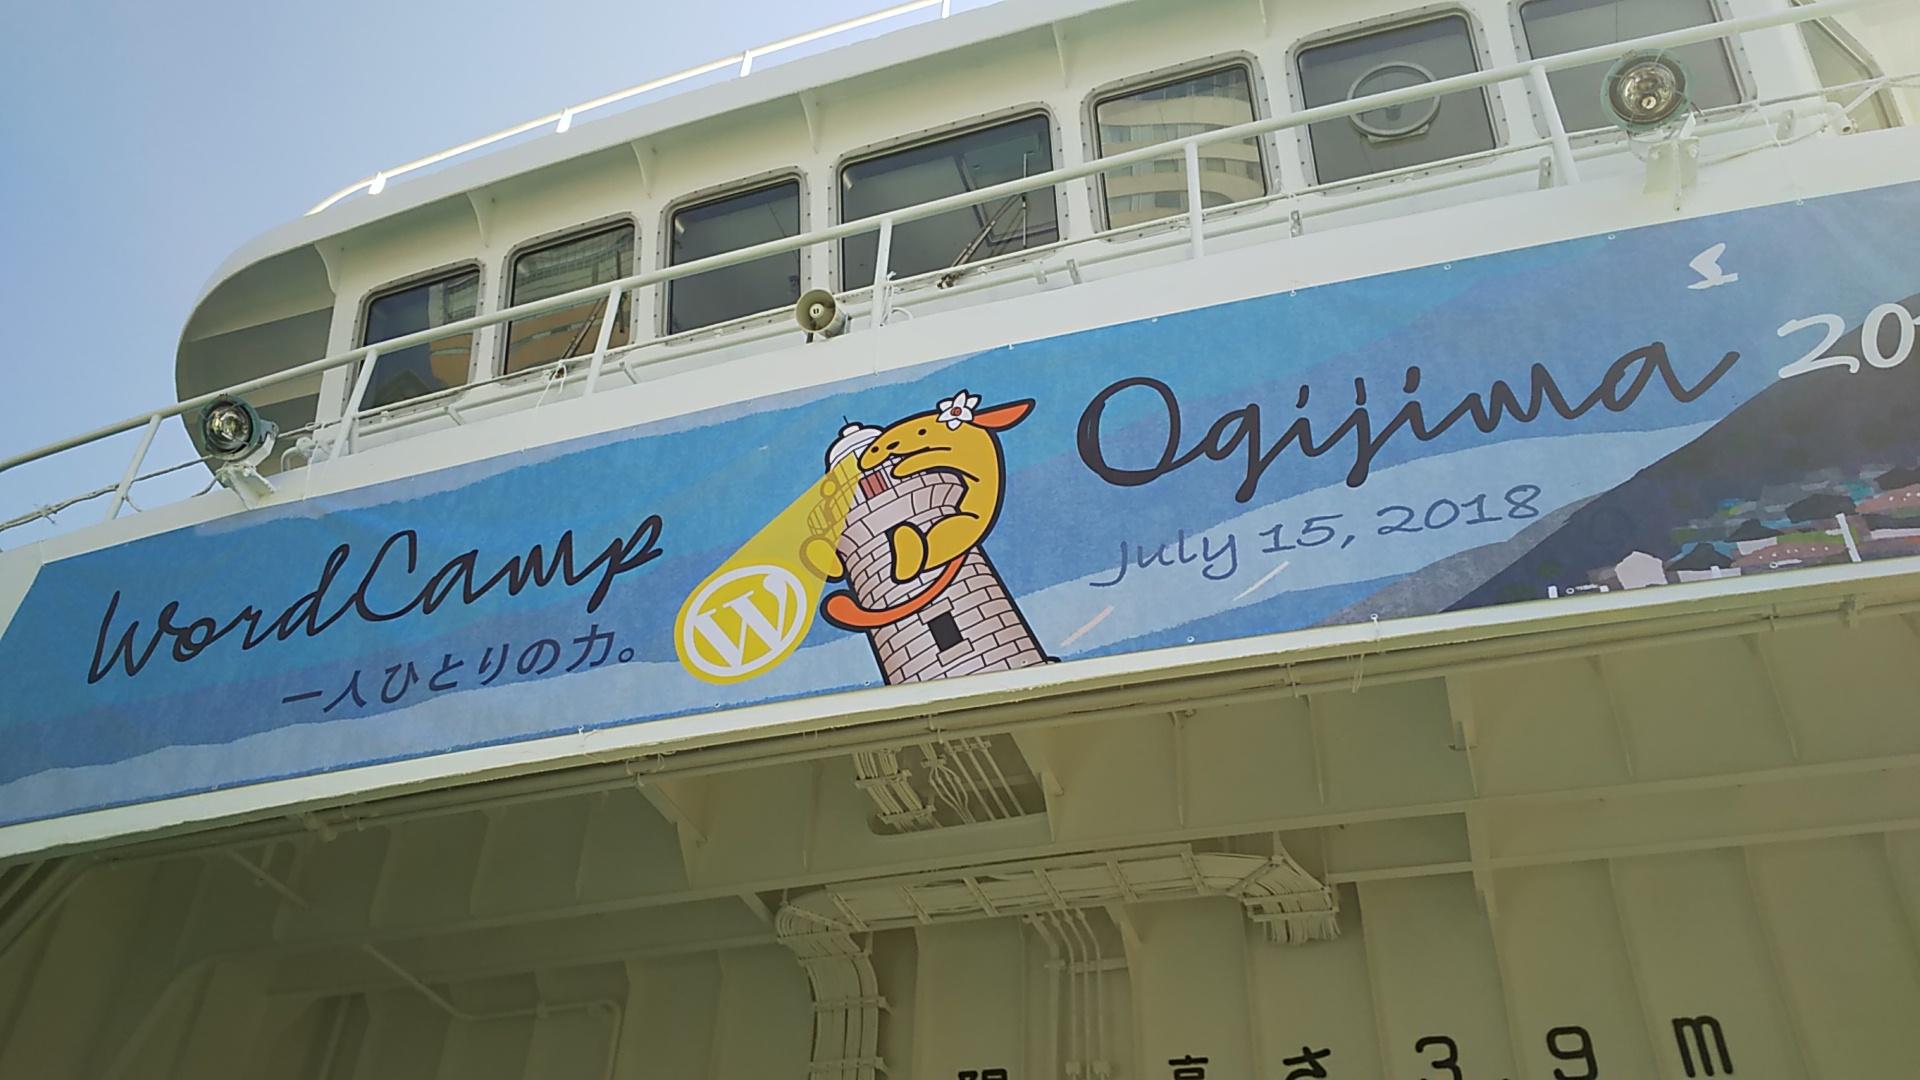 WordCamp Ogijima 2018 の往路フェリーの横断幕